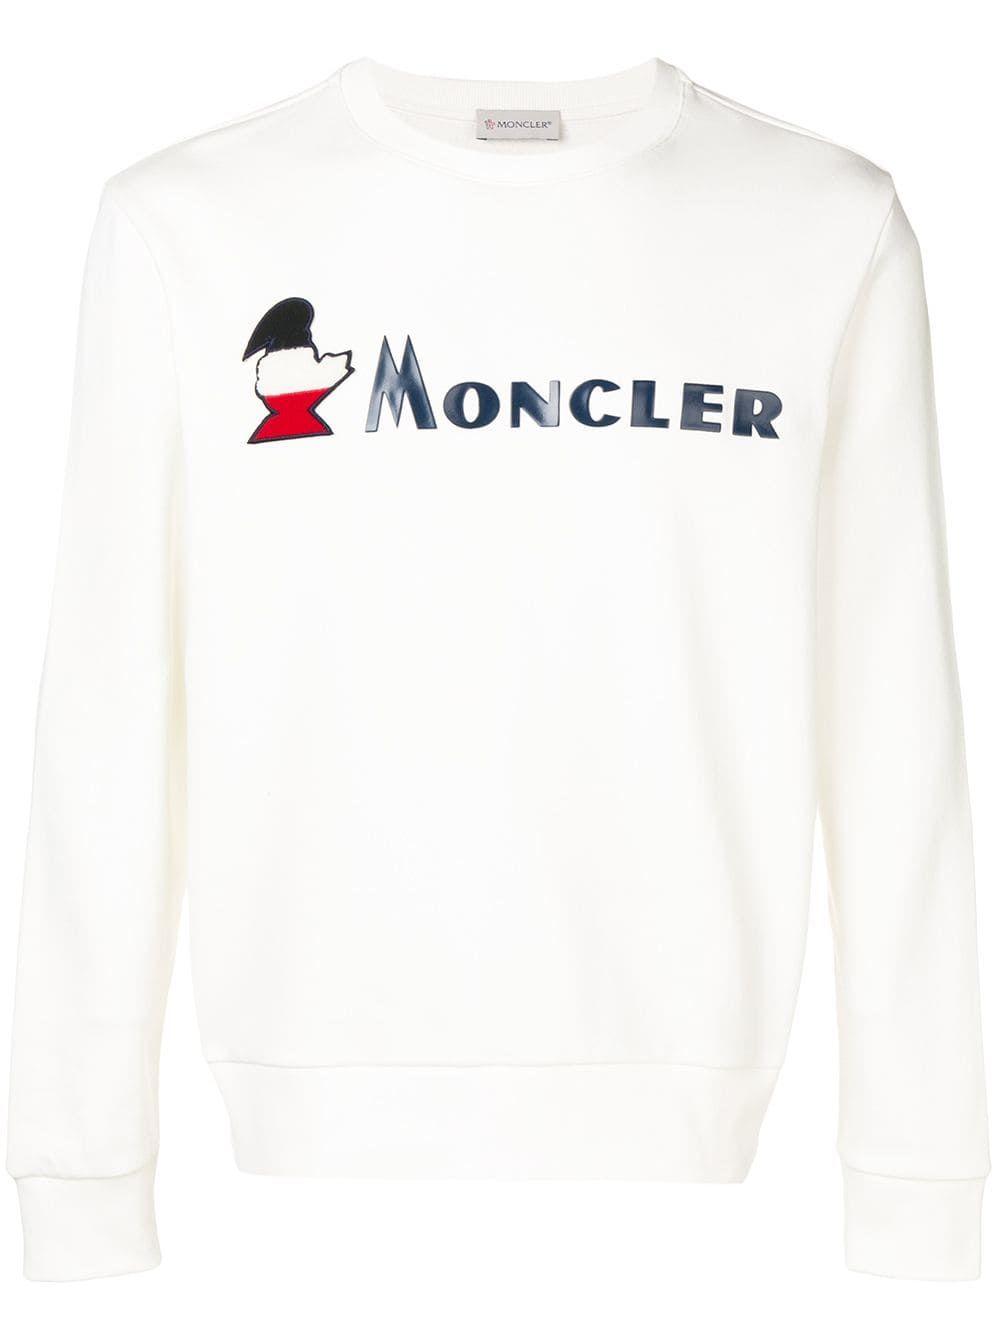 de2c4aee3 MONCLER MONCLER LOGO PRINT SWEATSHIRT - WHITE.  moncler  cloth ...